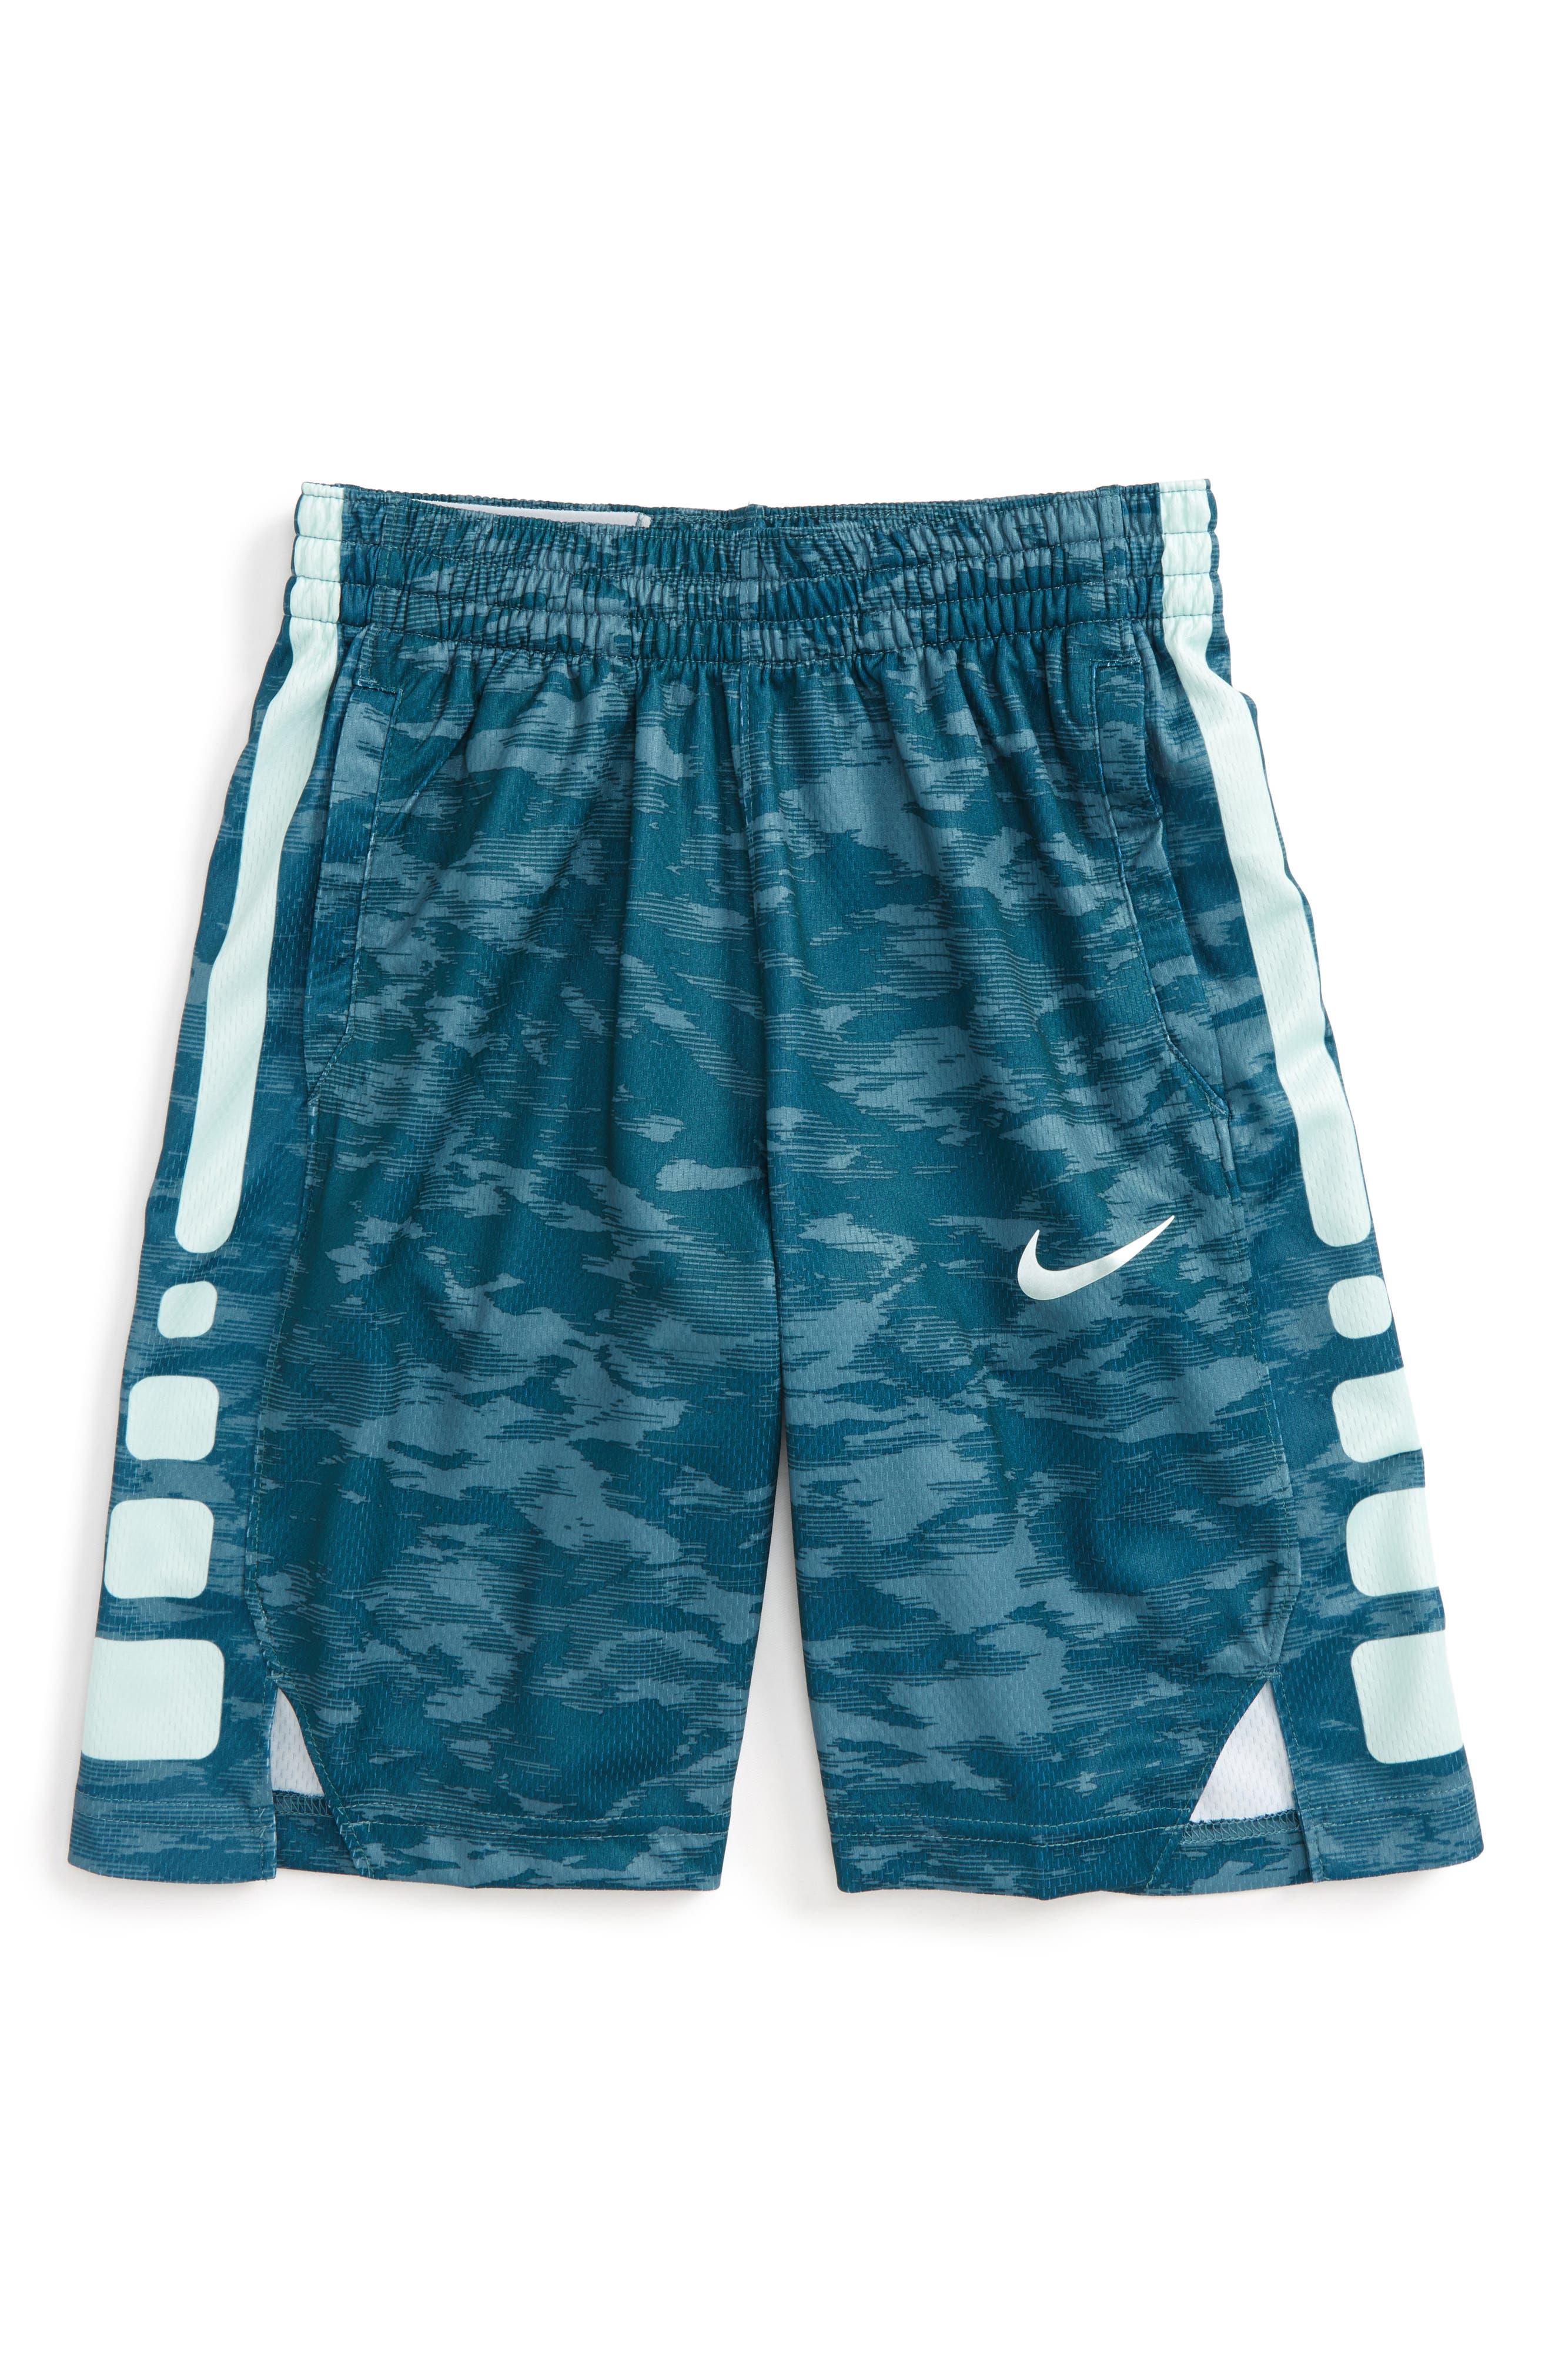 Dry Elite Basketball Shorts,                             Main thumbnail 5, color,